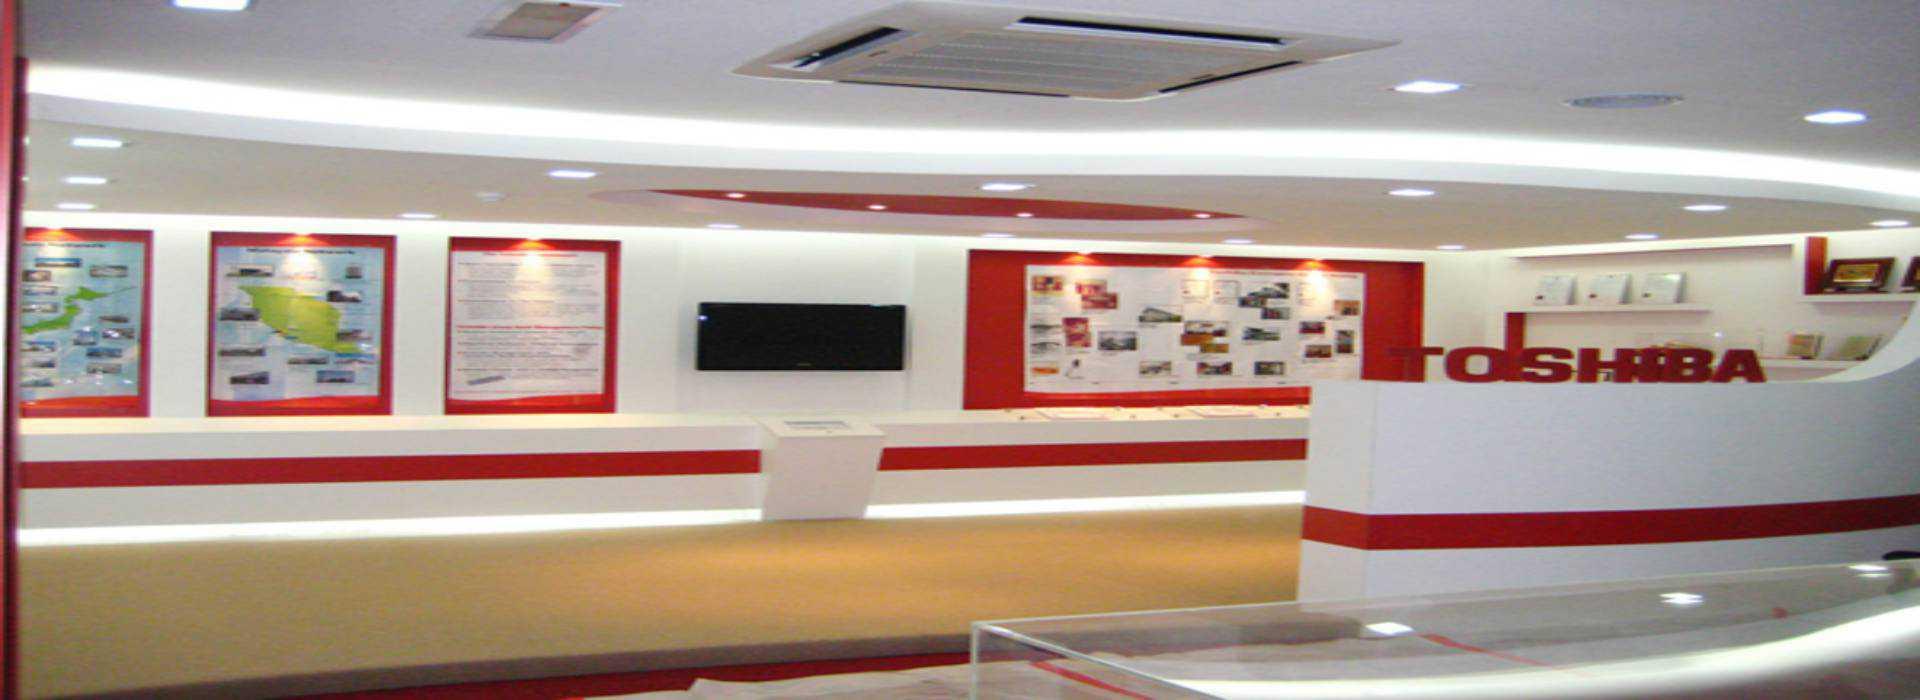 Toshiba Malaysia Customer Service Number Address Customerservicedirectory